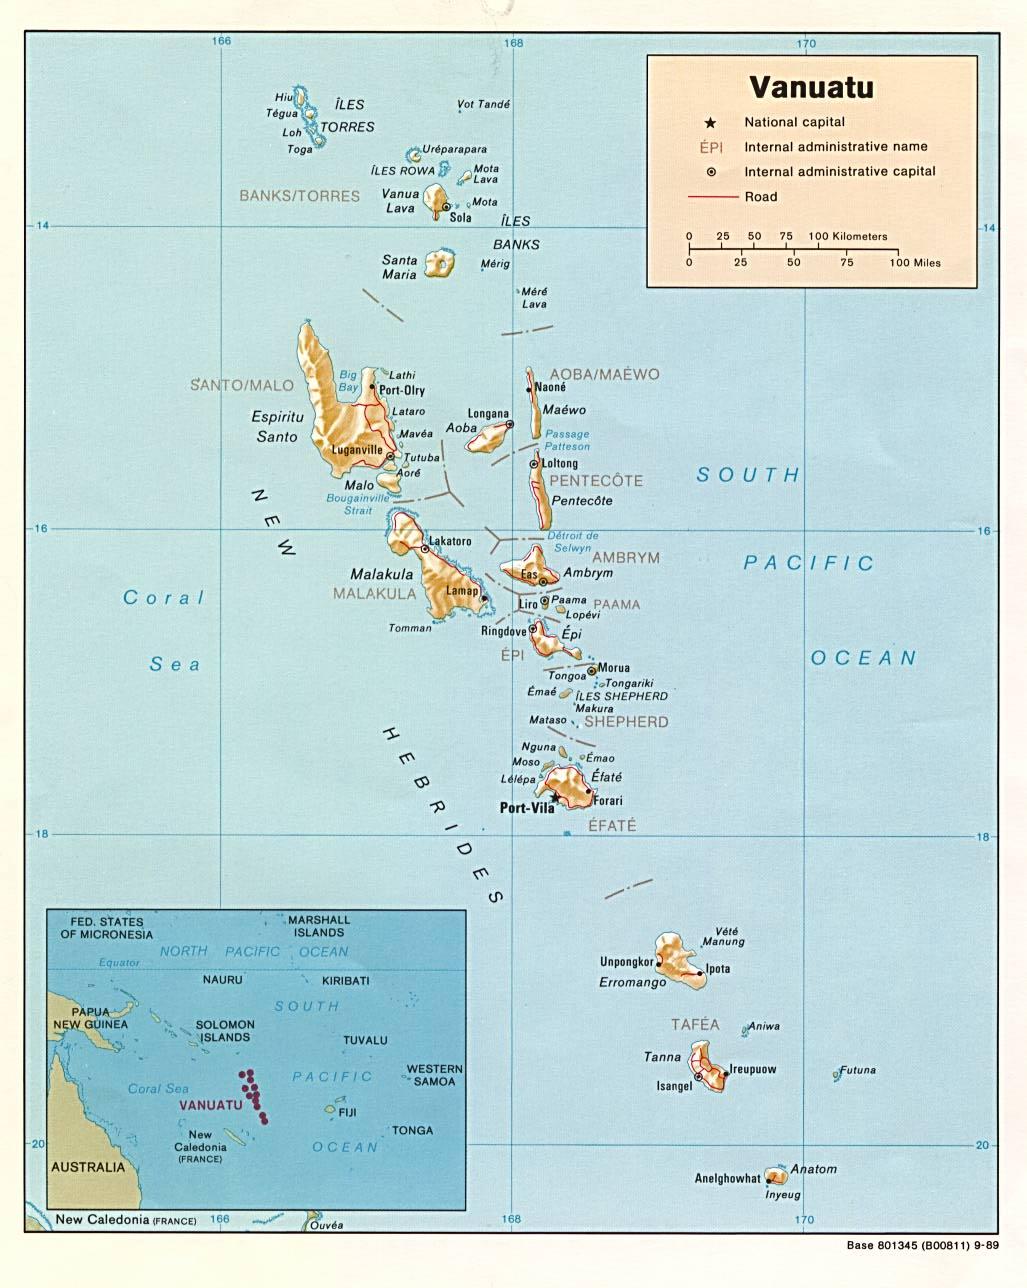 http://www.lib.utexas.edu/maps/islands_oceans_poles/vanuatu.jpg